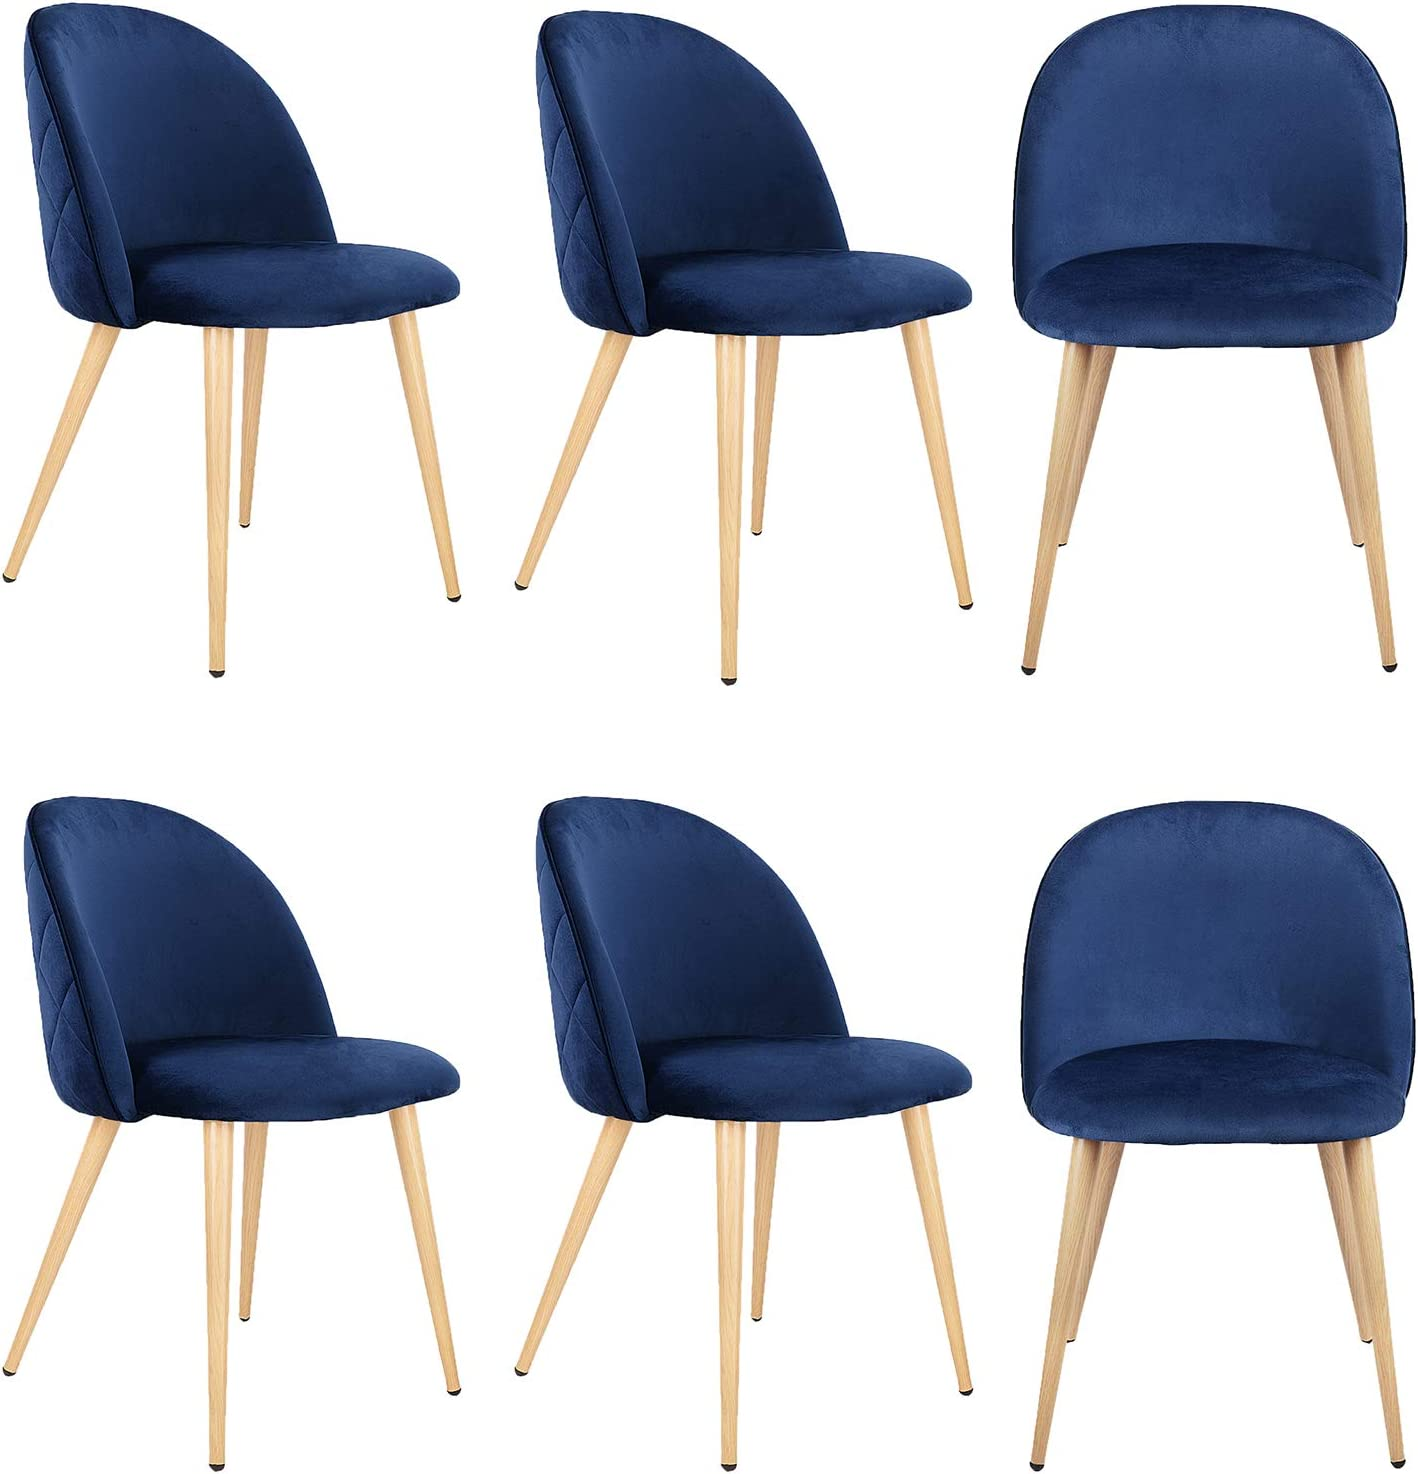 Set of お求めやすく価格改定 6 安心の実績 高価 買取 強化中 Retro Velvet Chairs Uphols Fabric Lounge Dining